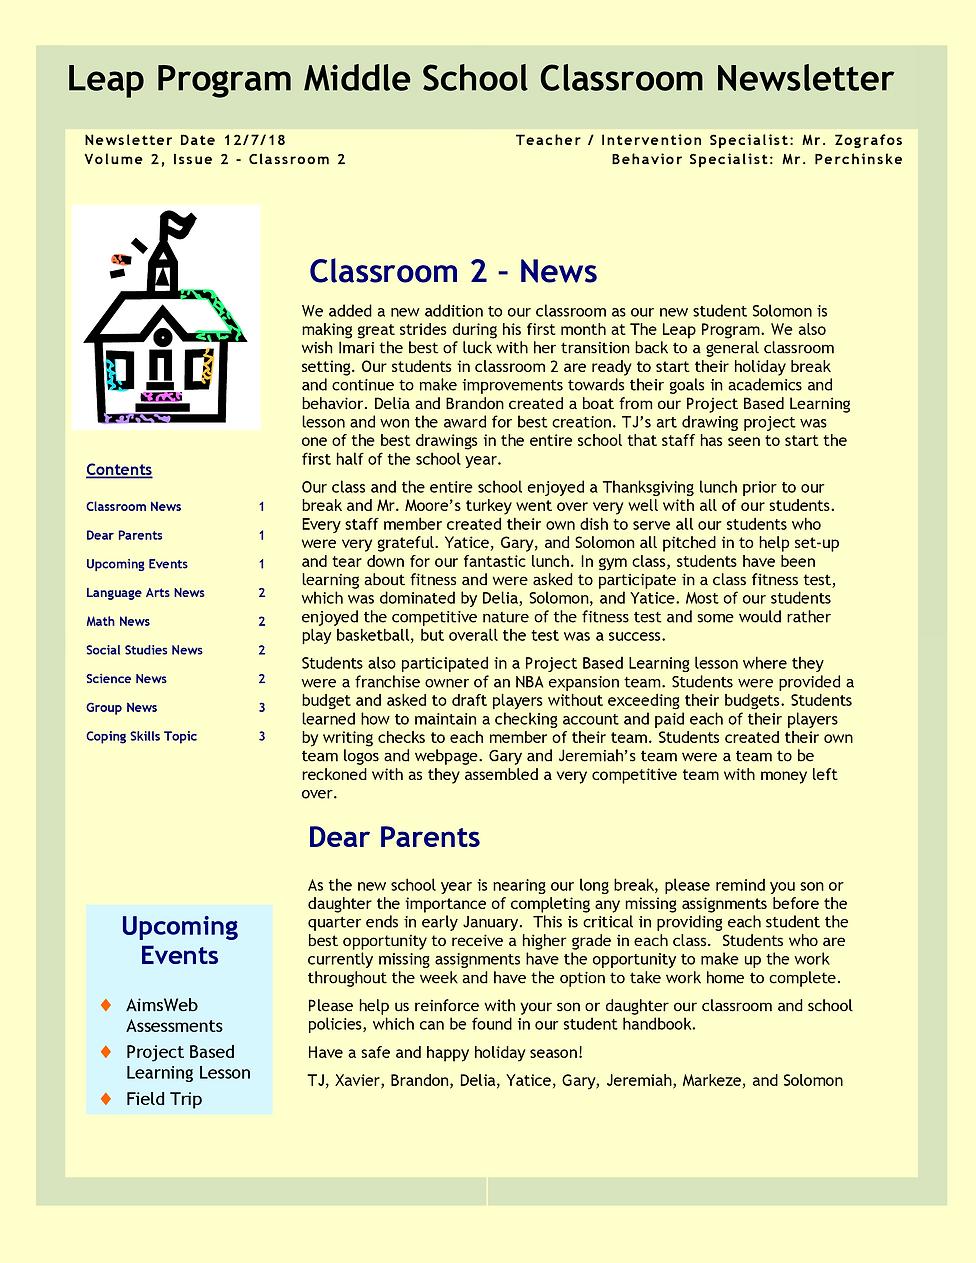 Classroom 2 Winter Newsletter-0.png